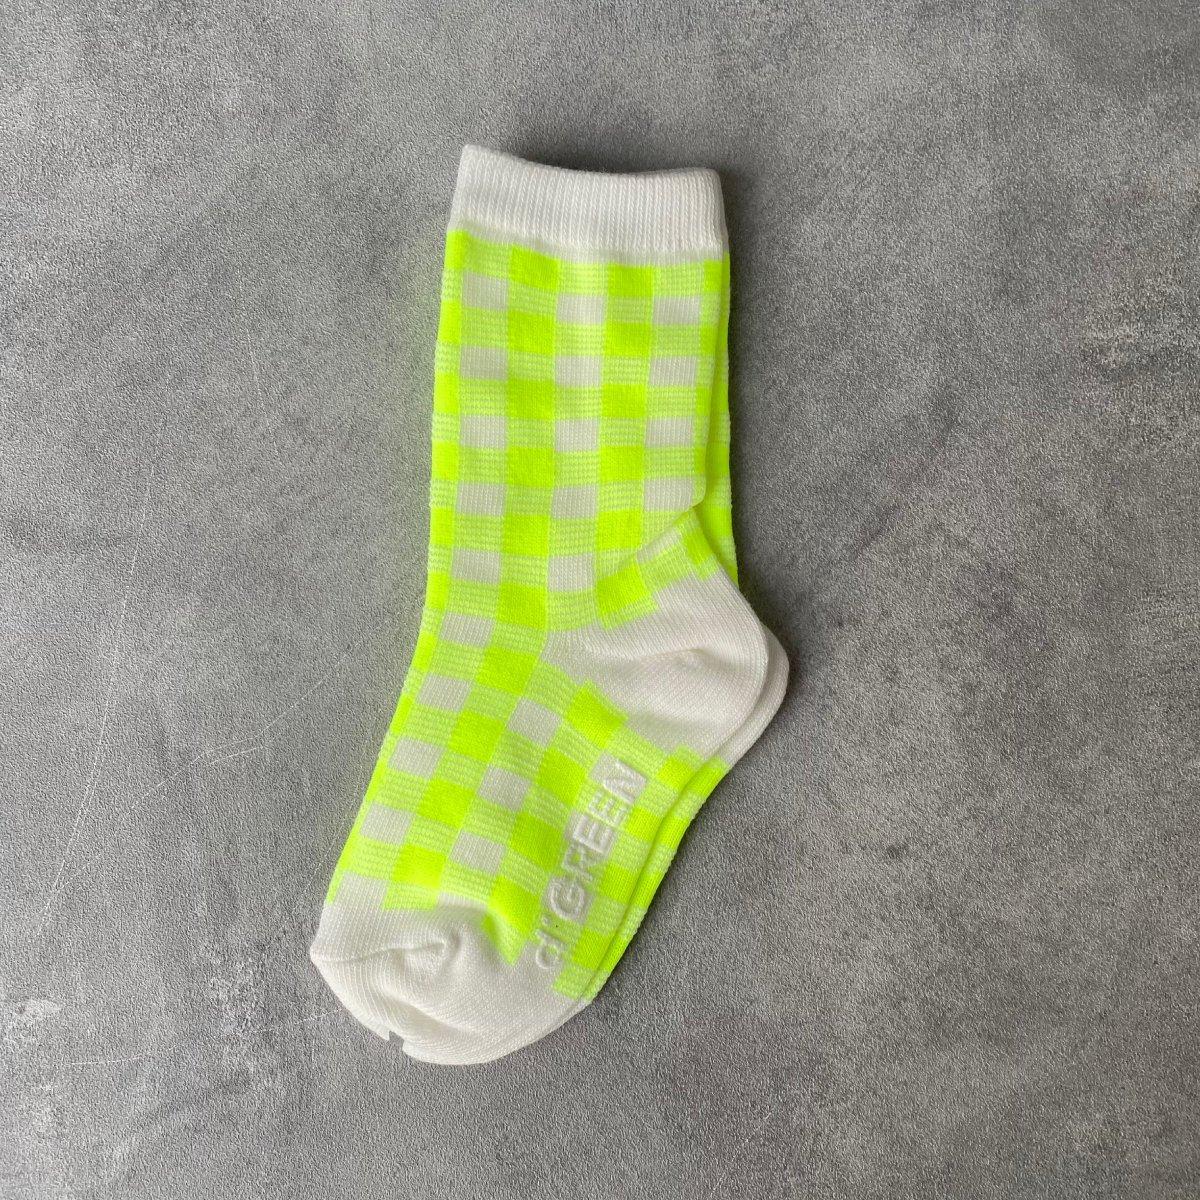 【BABY】Neon Check Socks 詳細画像3